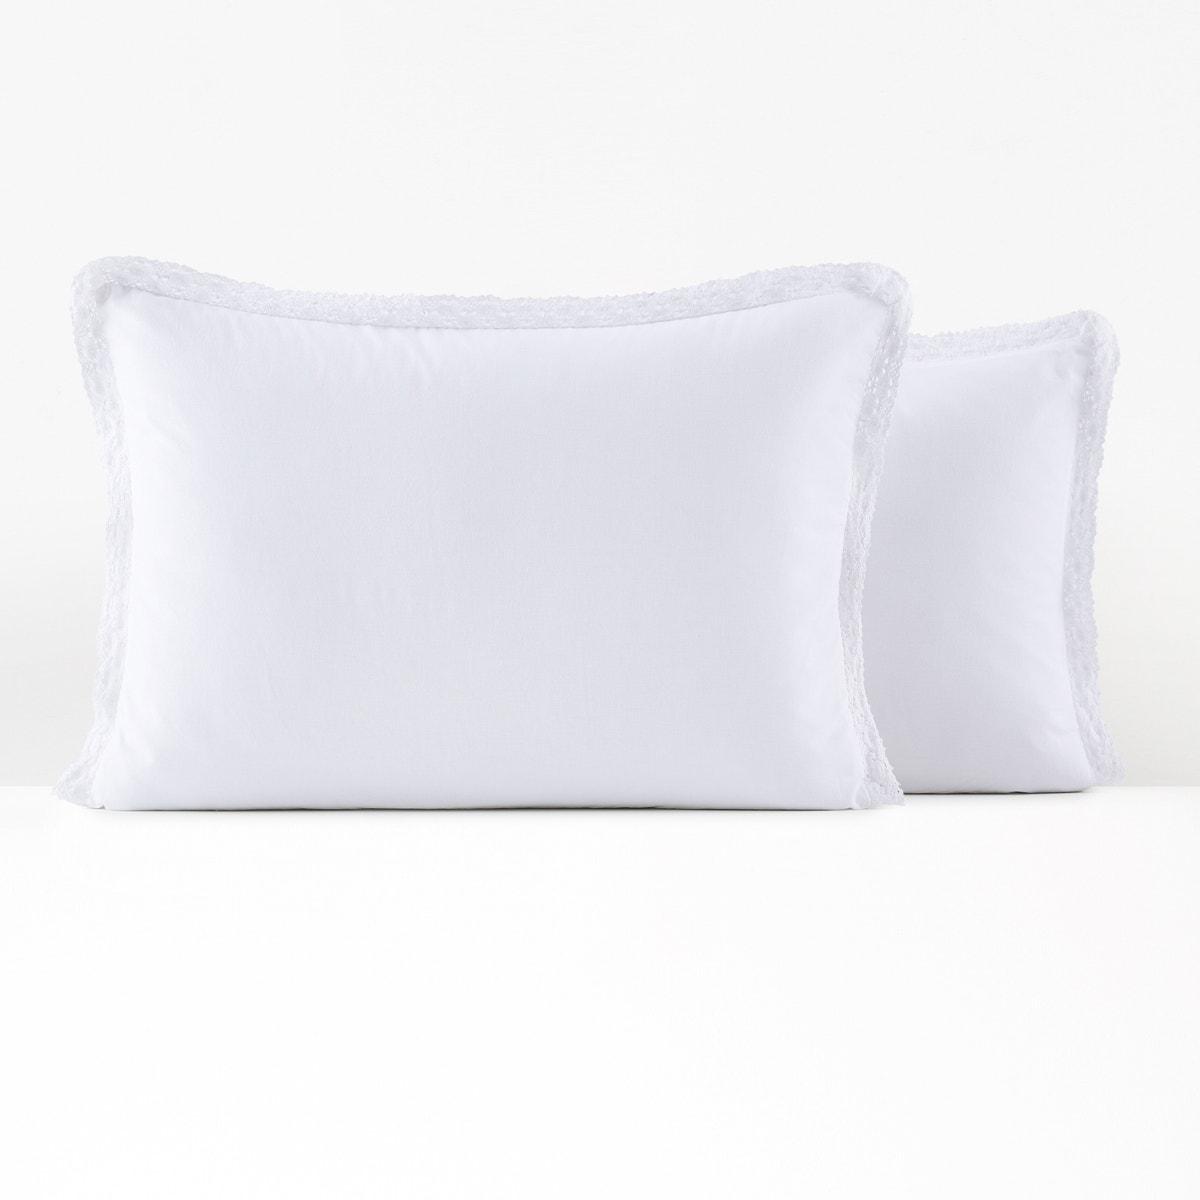 Alhambra ウォッシュ加工 コットン枕カバー